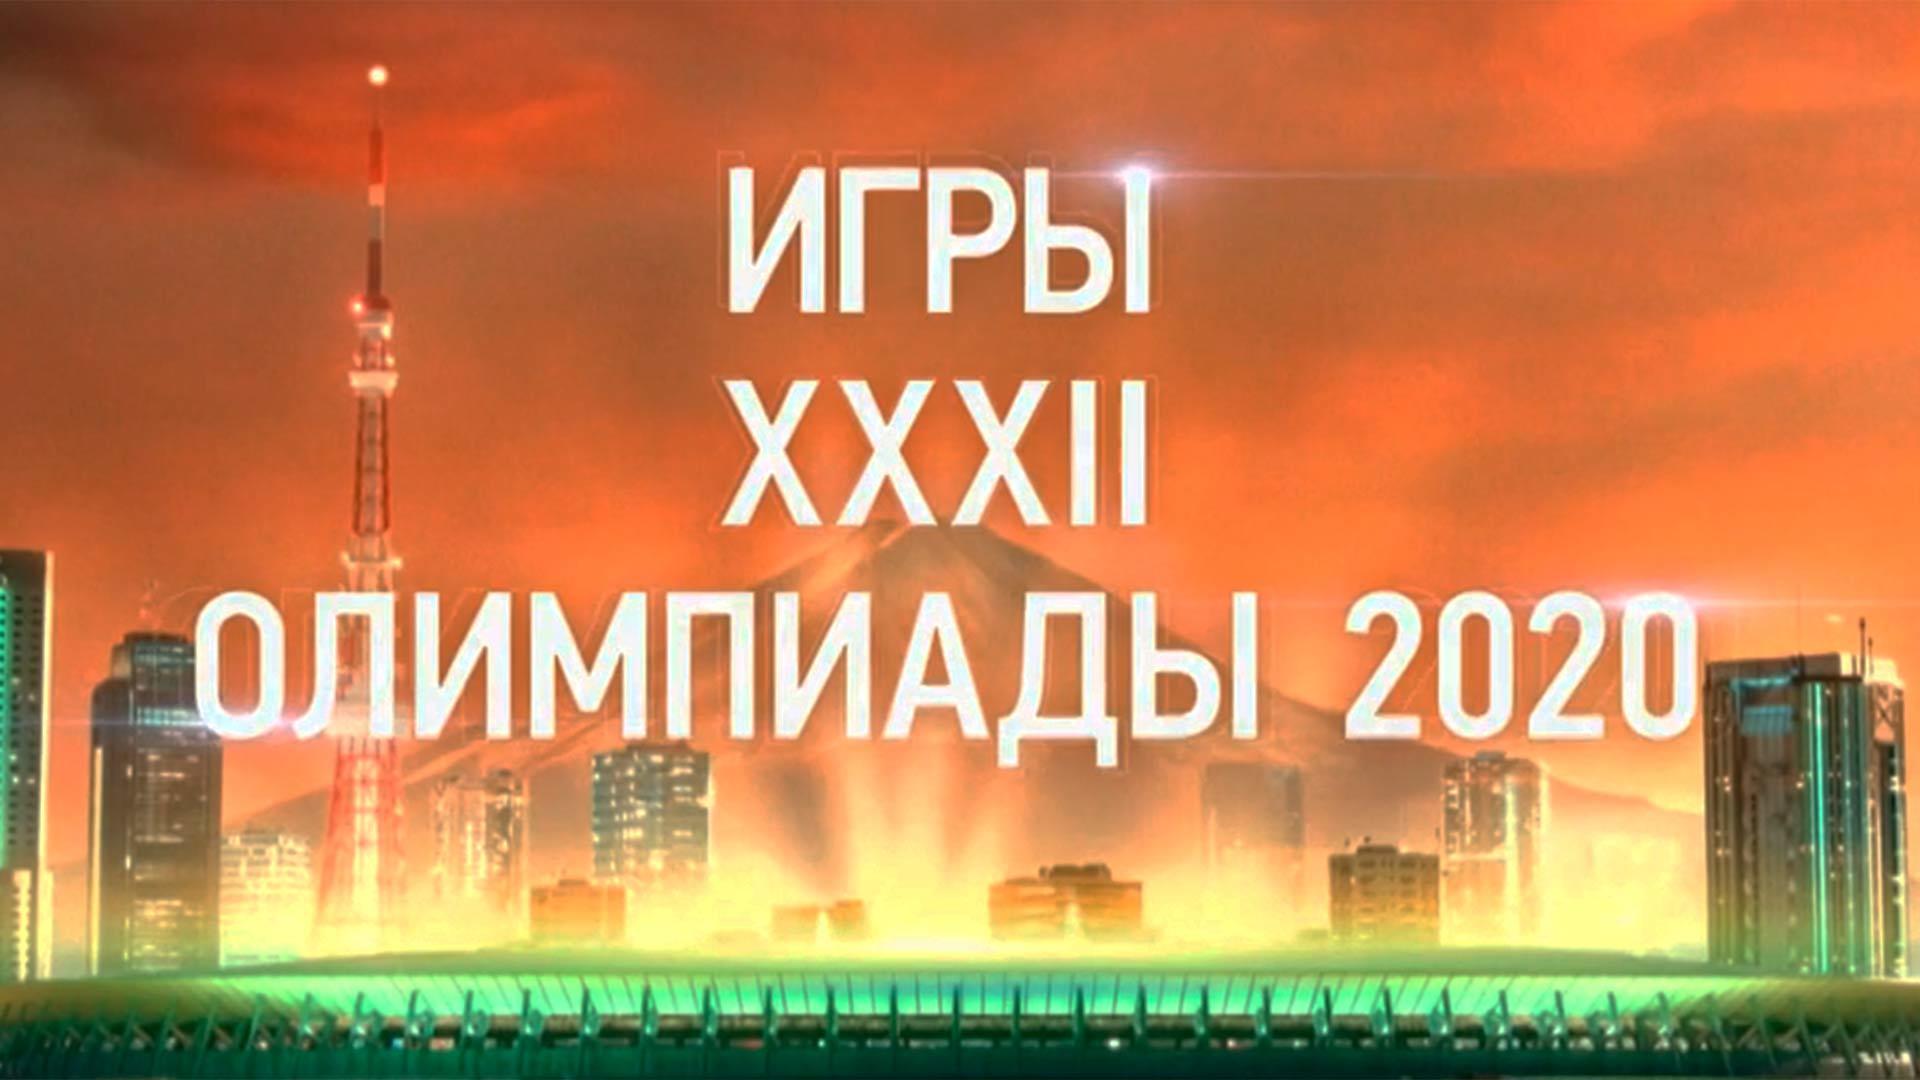 Дневник игр XXXII Олимпиады 2020 г. вТокио